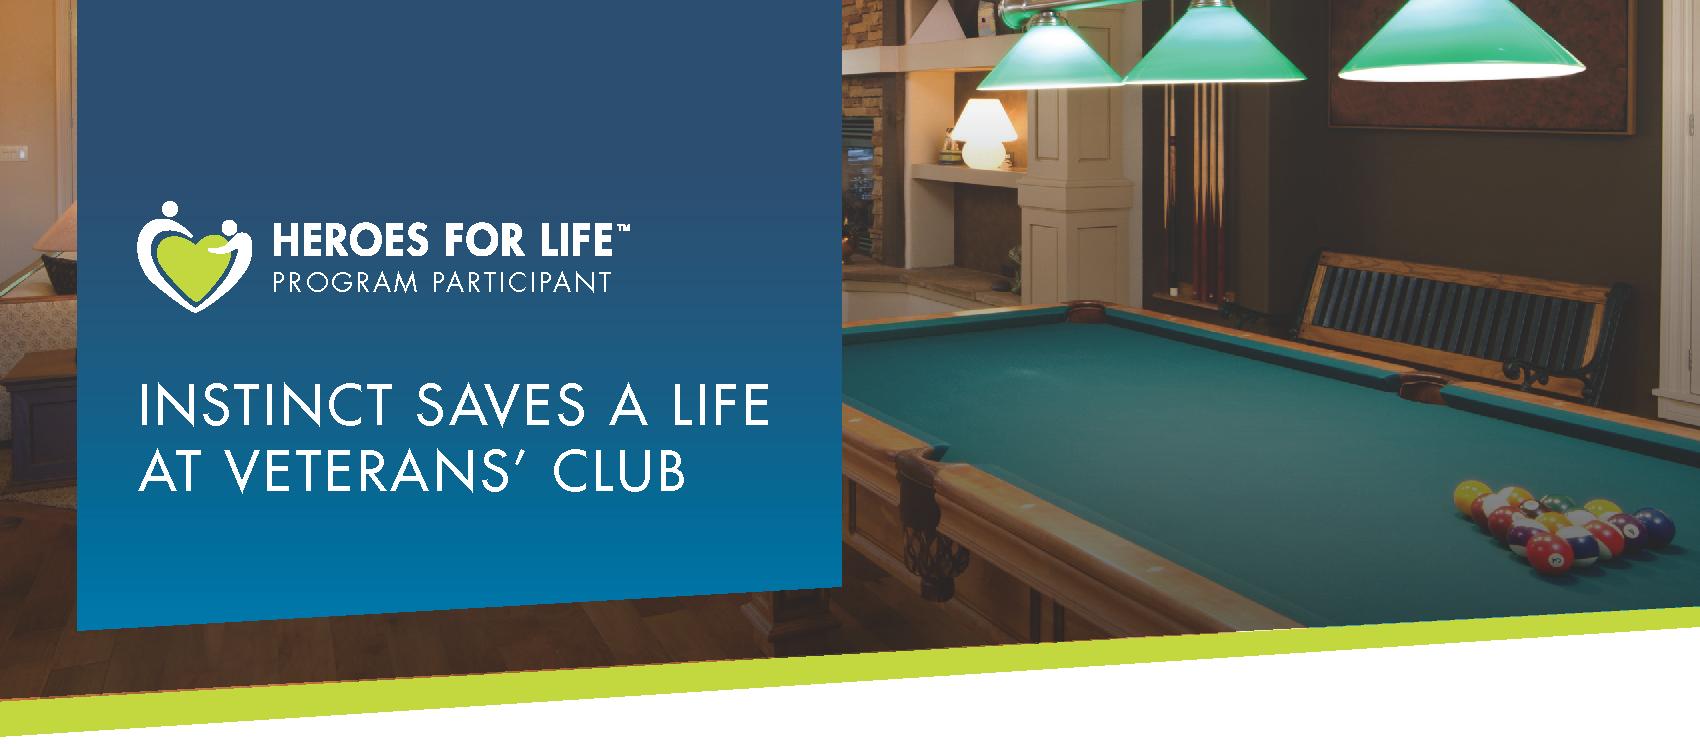 INSTINCT SAVES A LIFE AT VETERAN'S CLUB